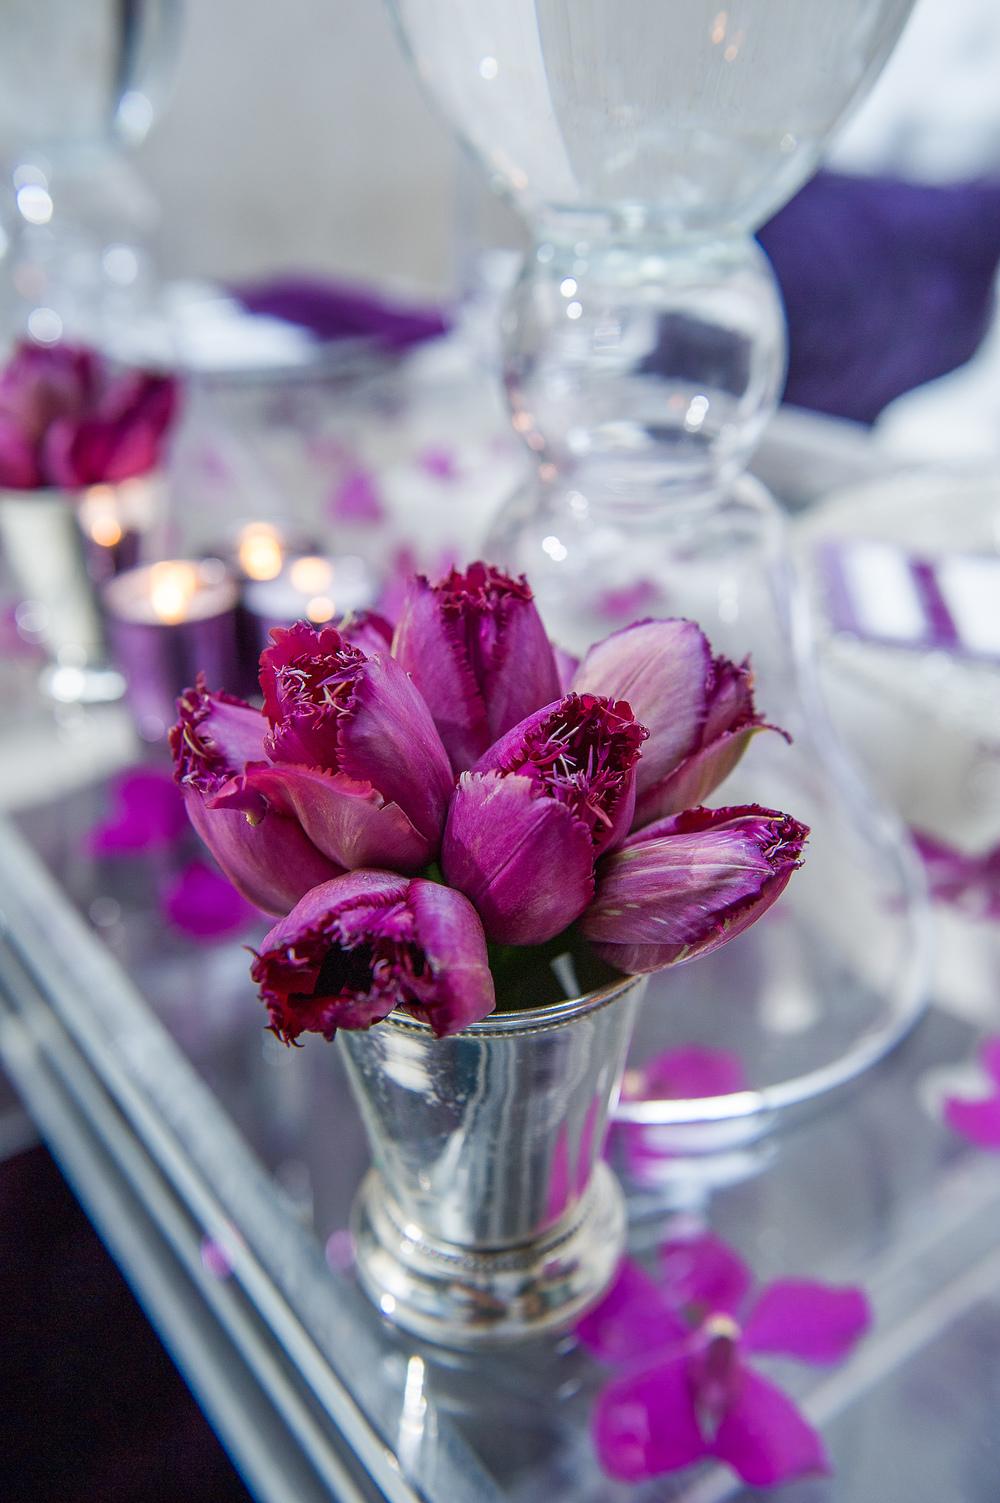 stewart_bertrand_wedding_photography_sdsw13-1027.jpg